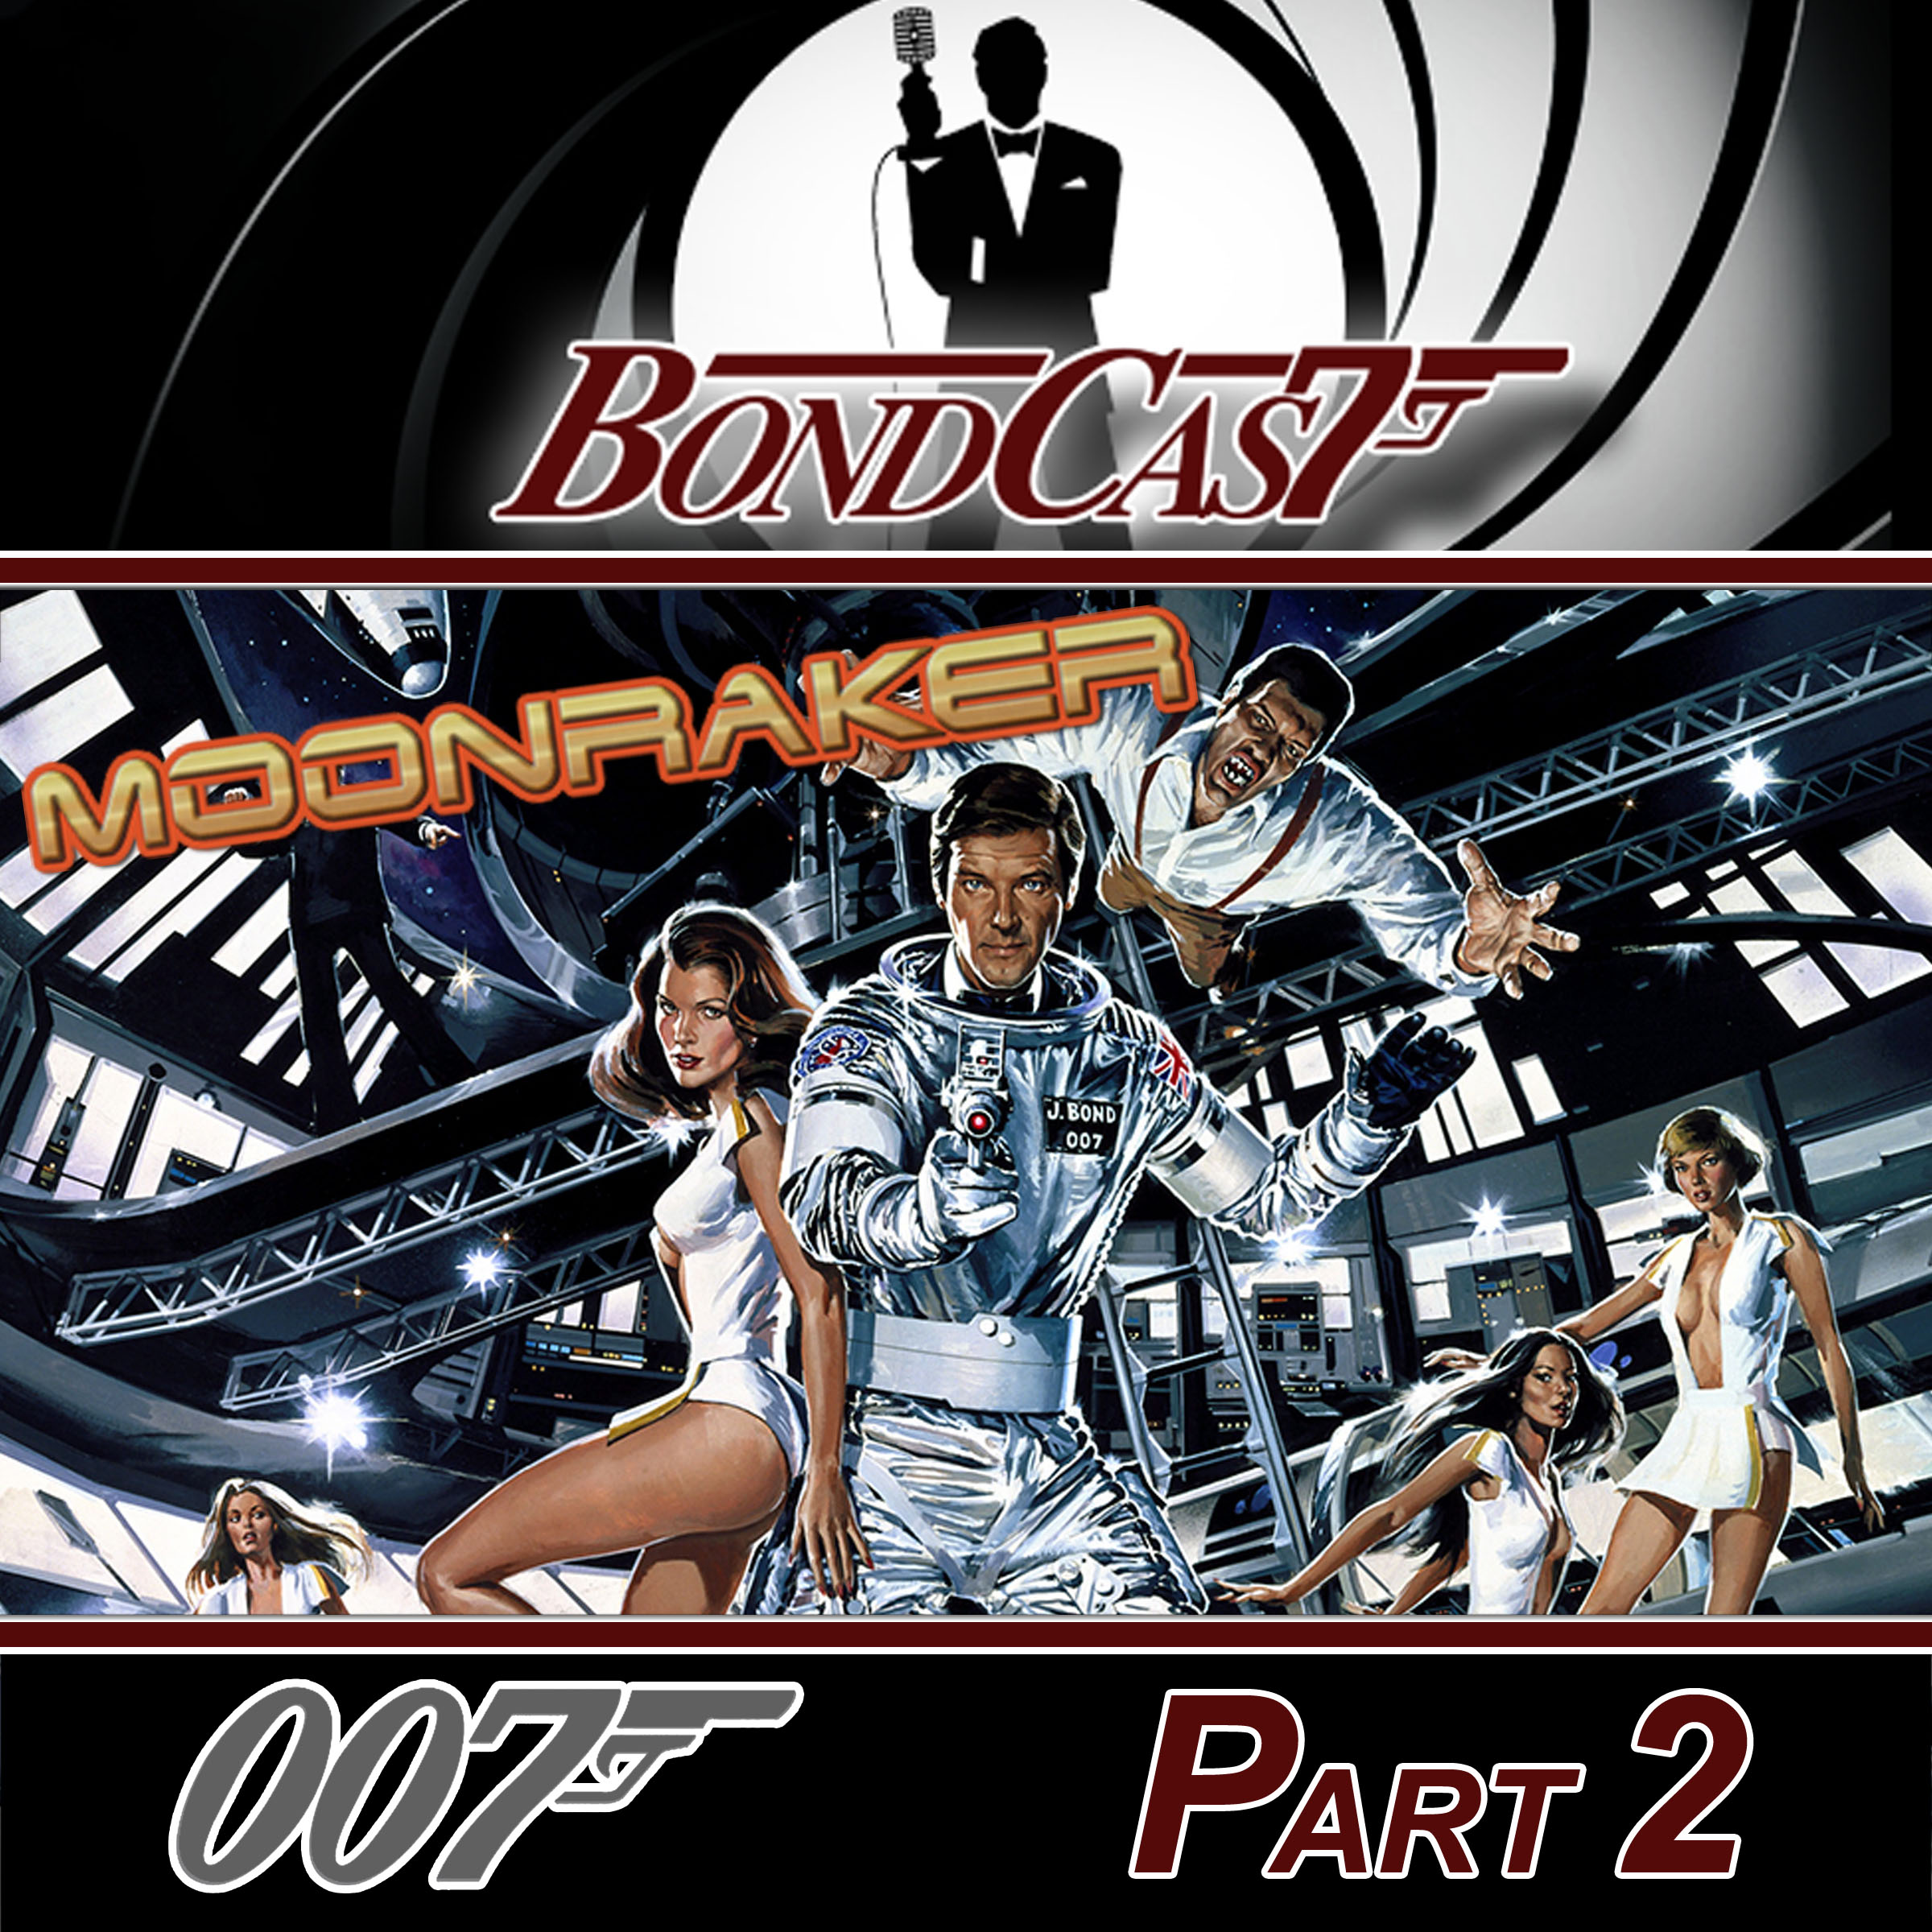 Bondcast - Moonraker - Part 2.jpg